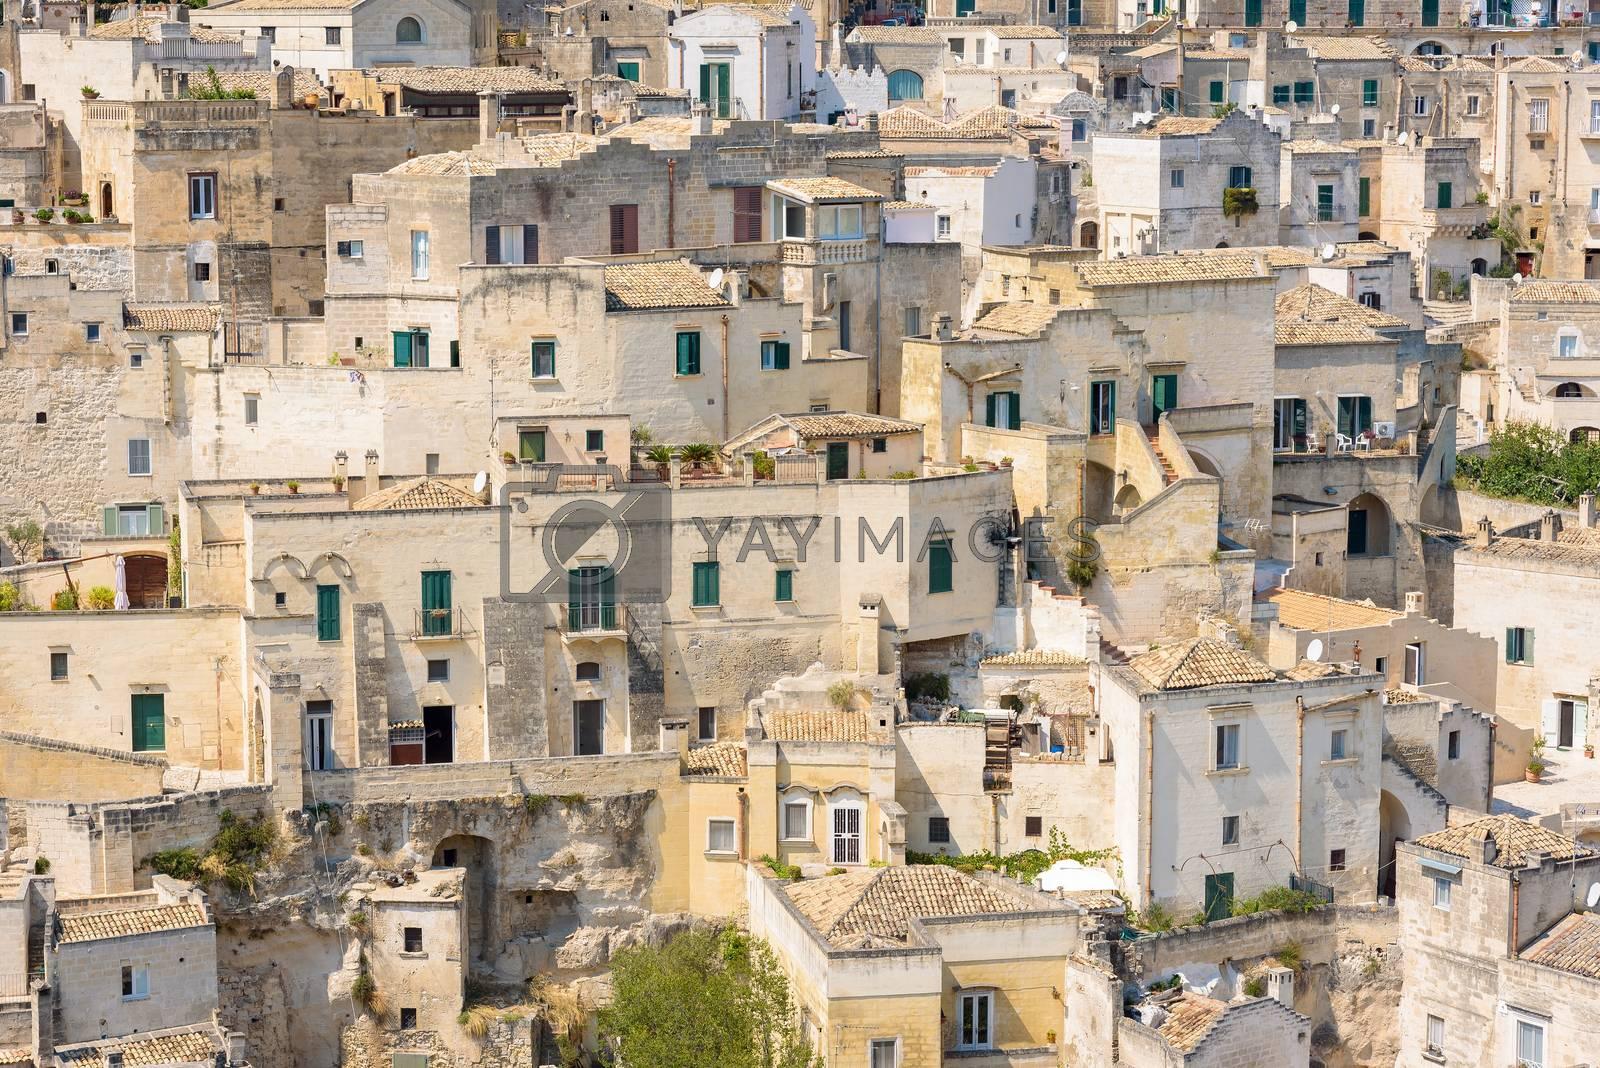 Architecture of the Sassi of Matera, Basilicata, Italy